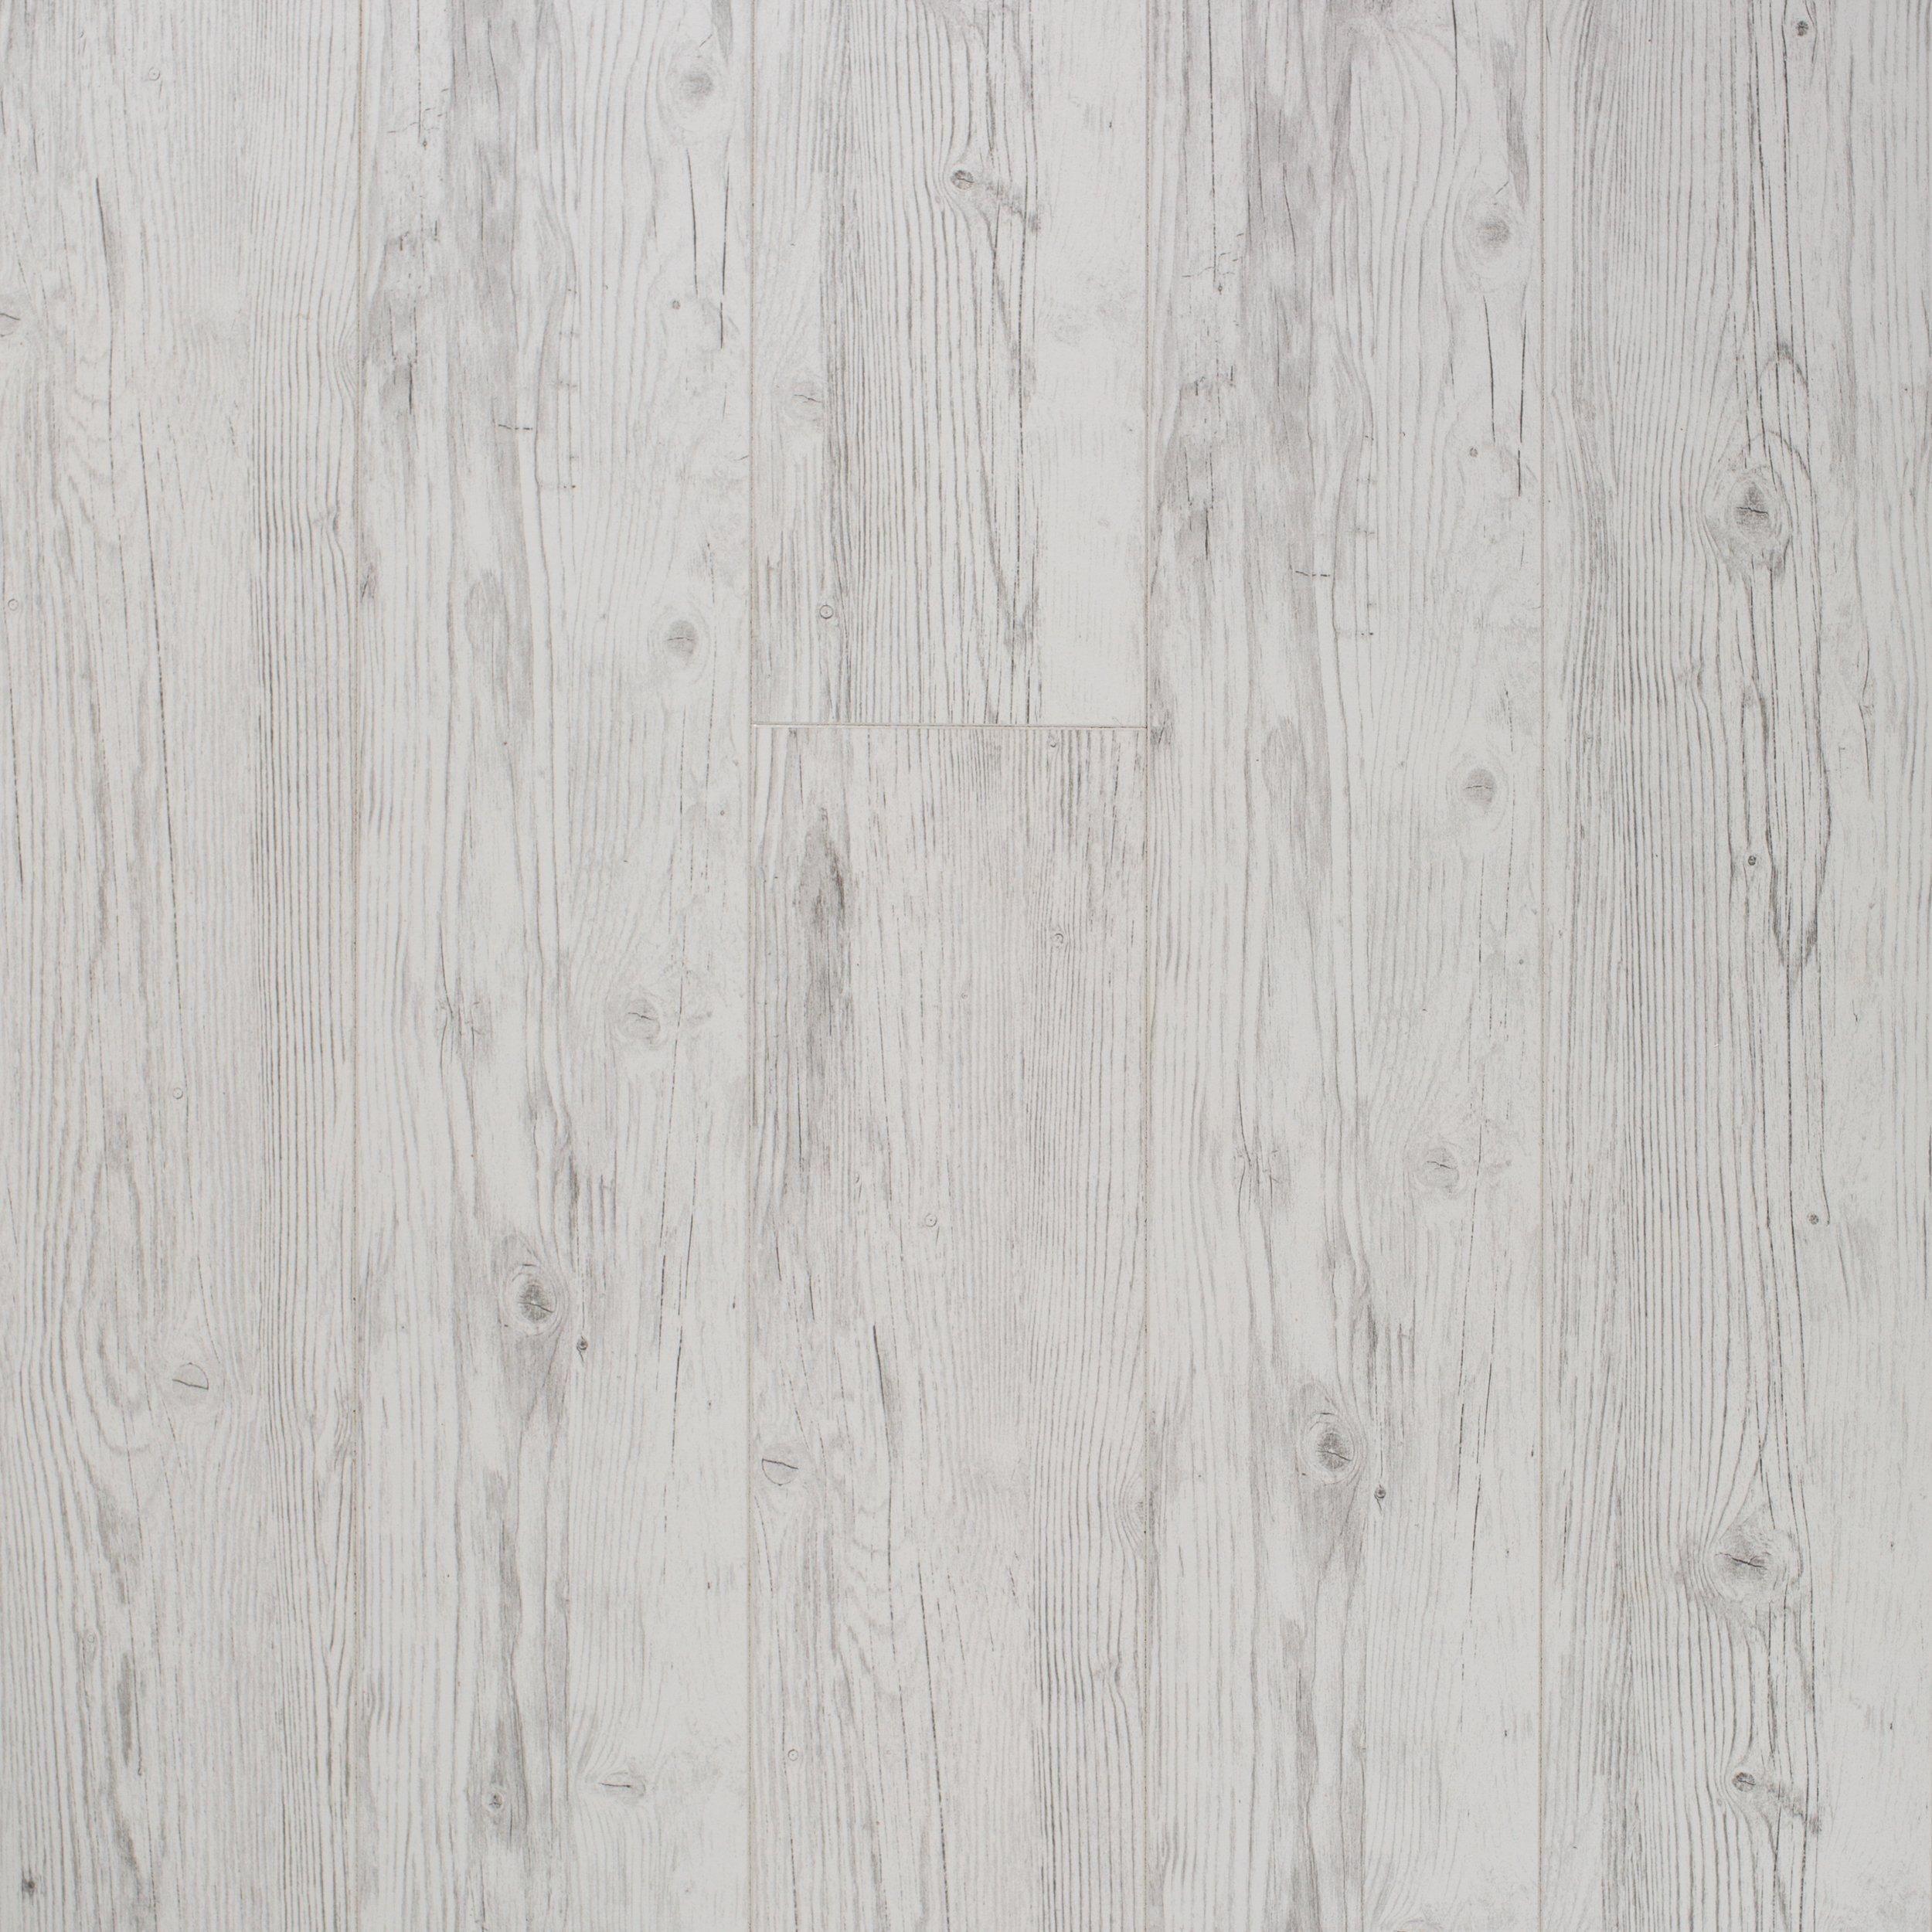 Coastal Drift Smooth Cork Plank In 2020 Cork Flooring Eco